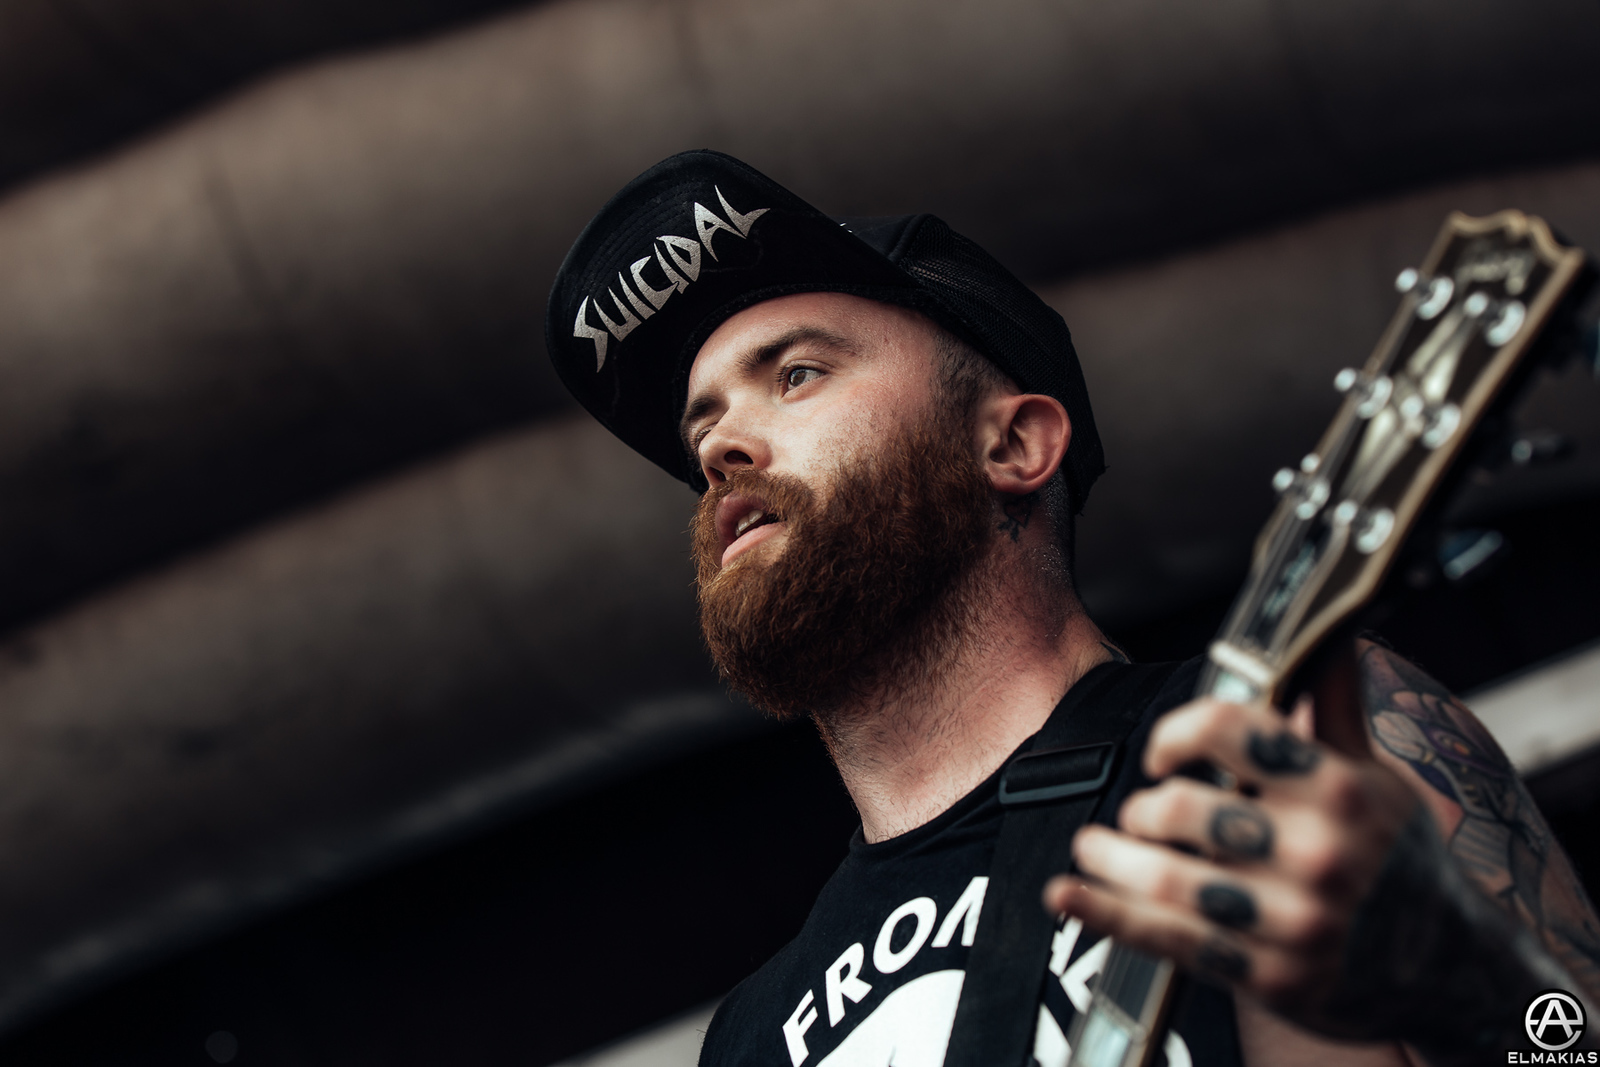 Taylor Lumley of Beartooth live at Vans Warped Tour 2015 by Adam Elmakias